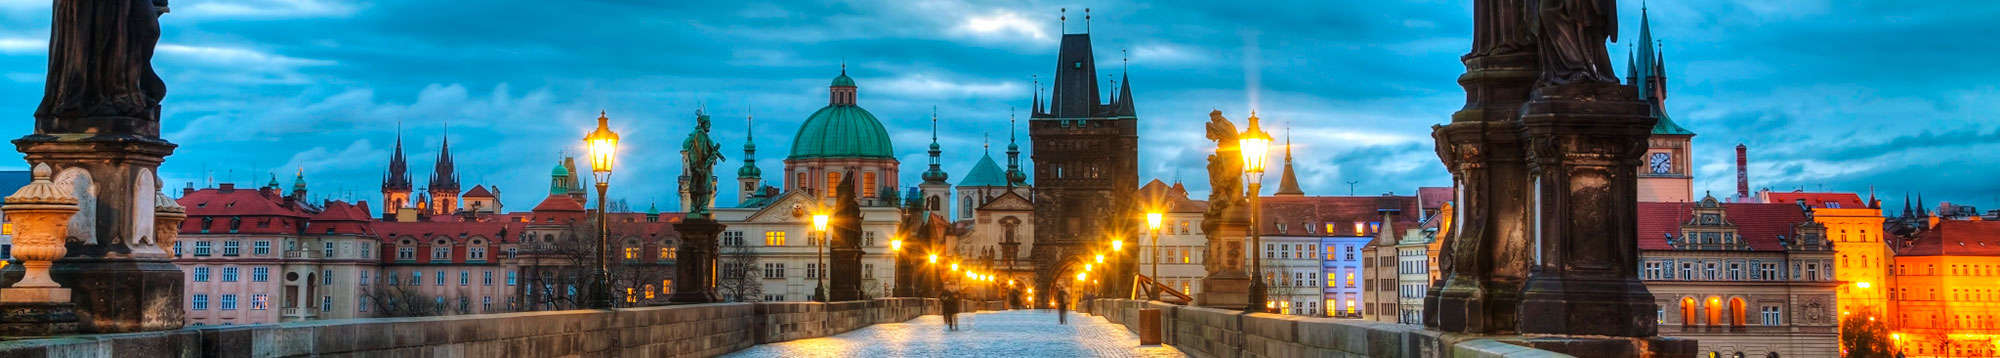 Weekendje weg in Praag